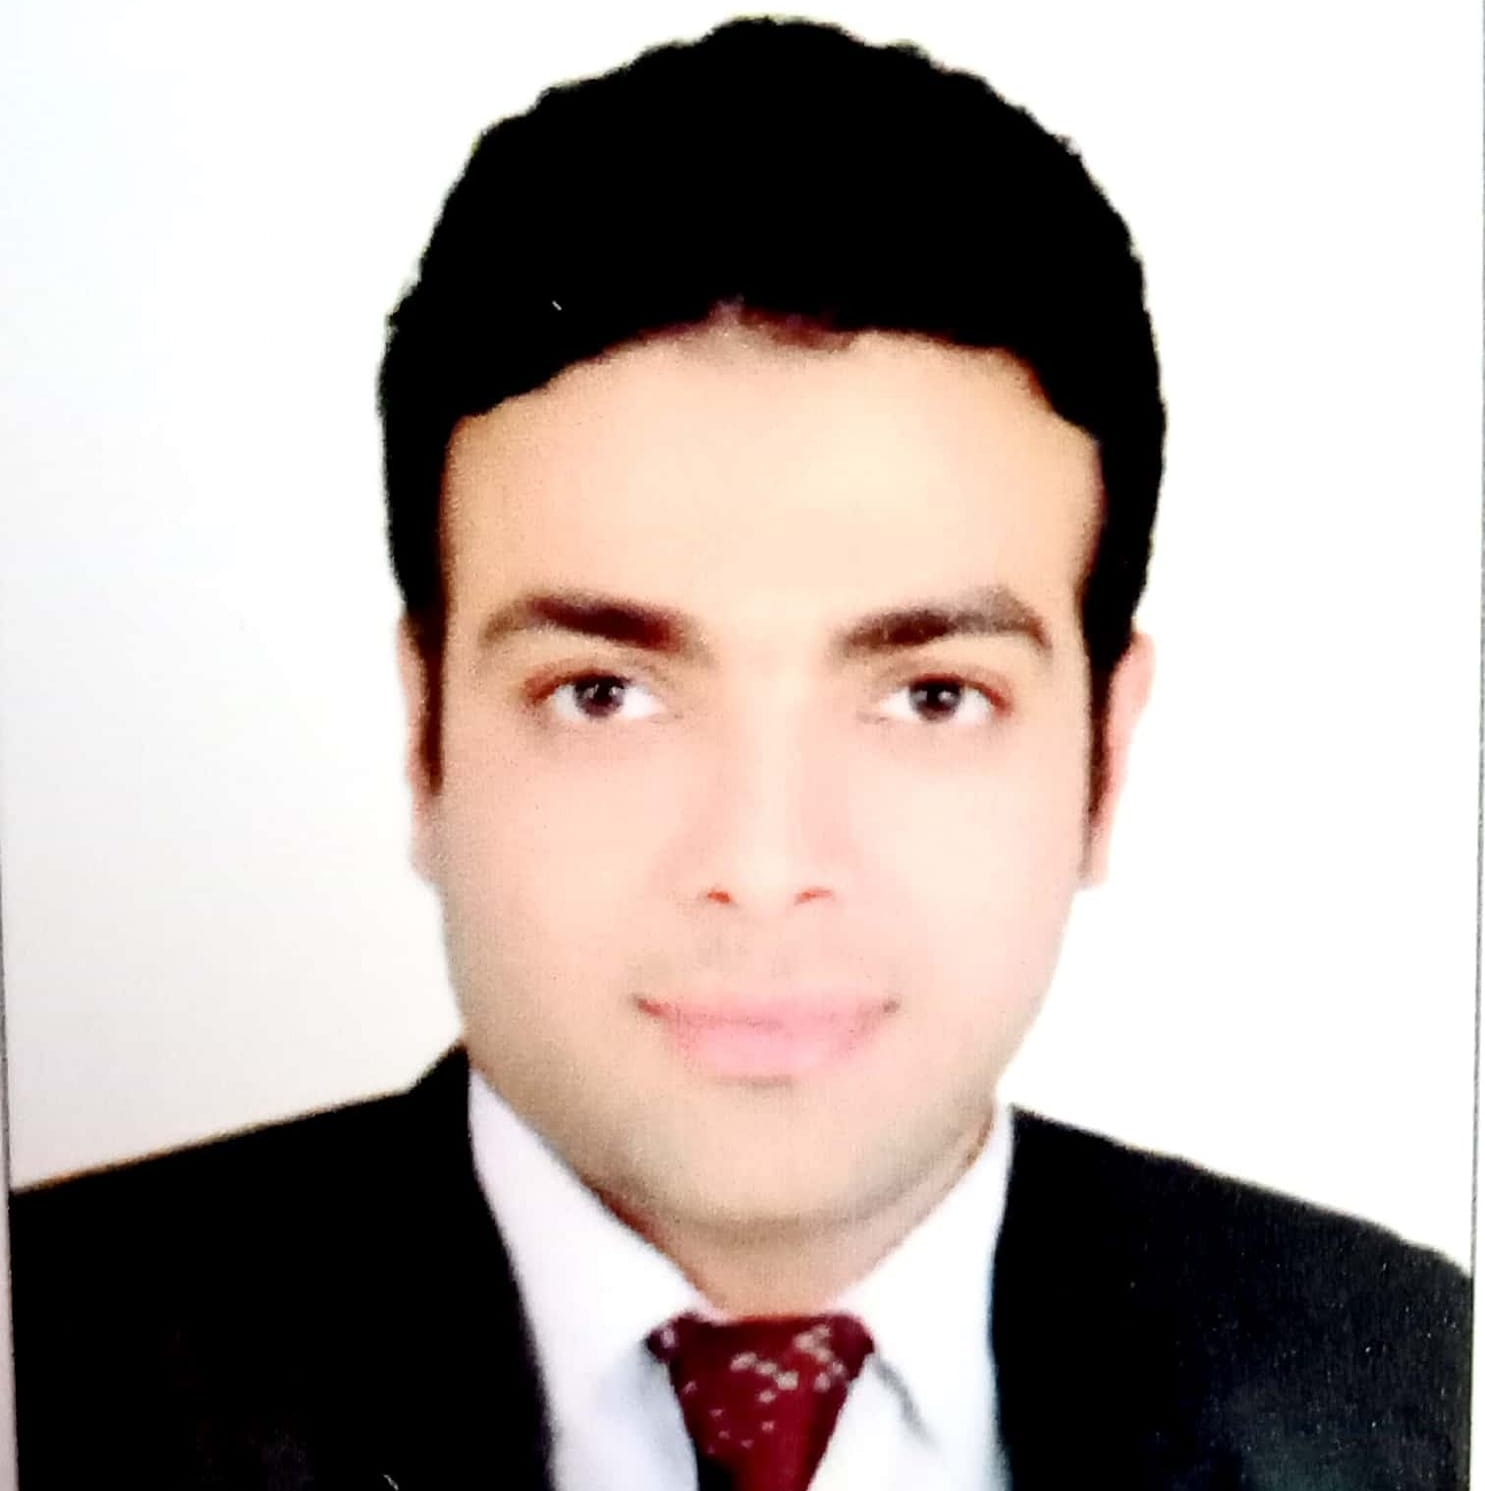 mahmoud negm Profile Picture